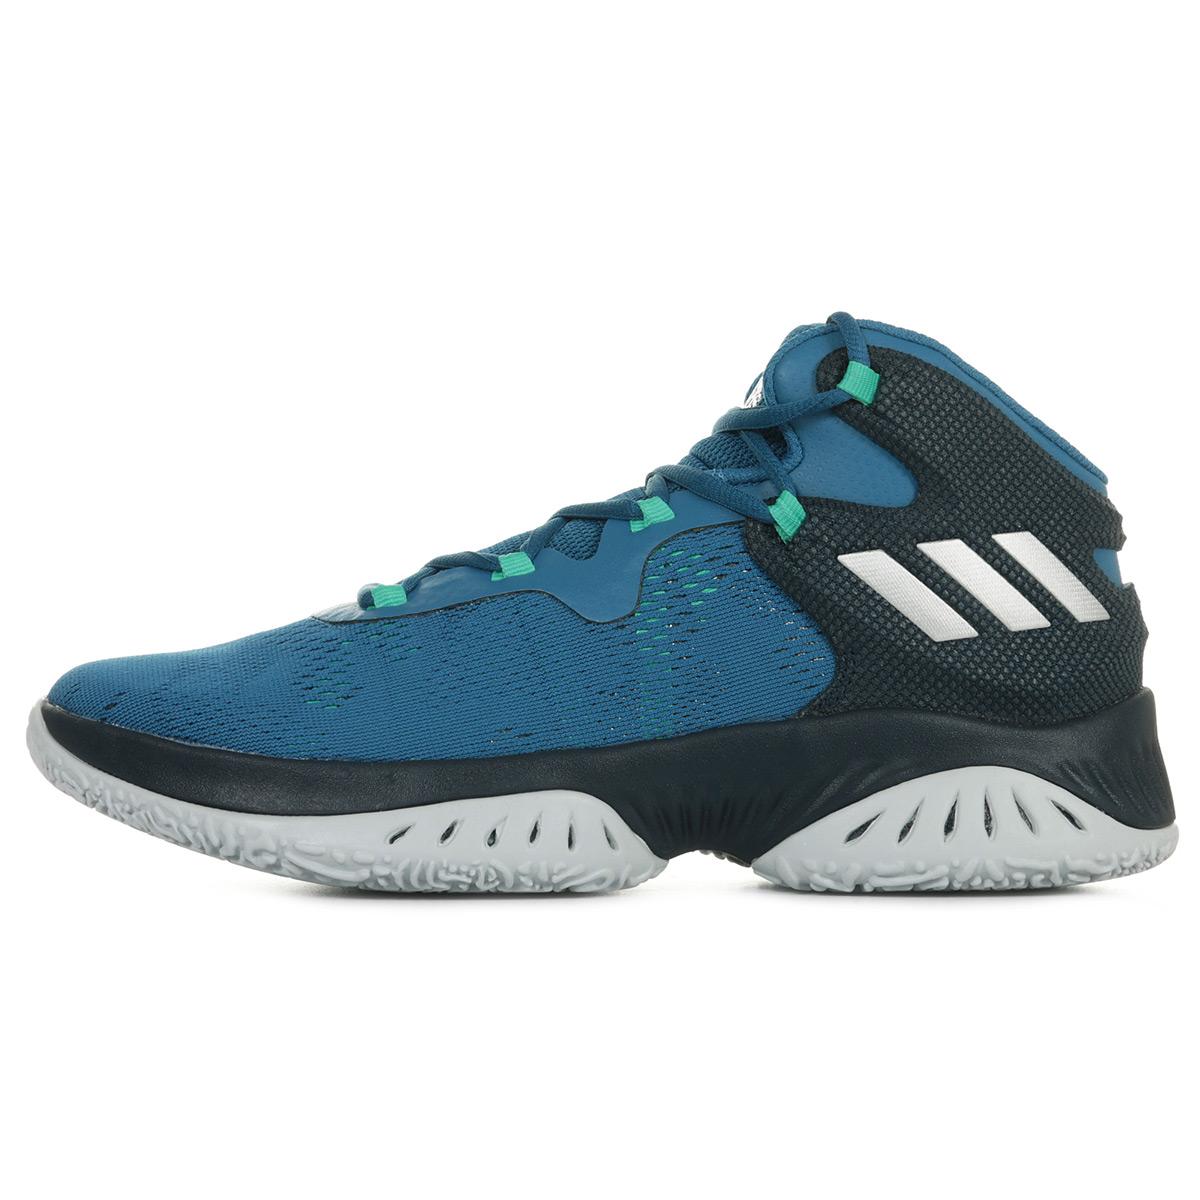 adidas Performance Explosive Bounce CQ0213, Basketball homme